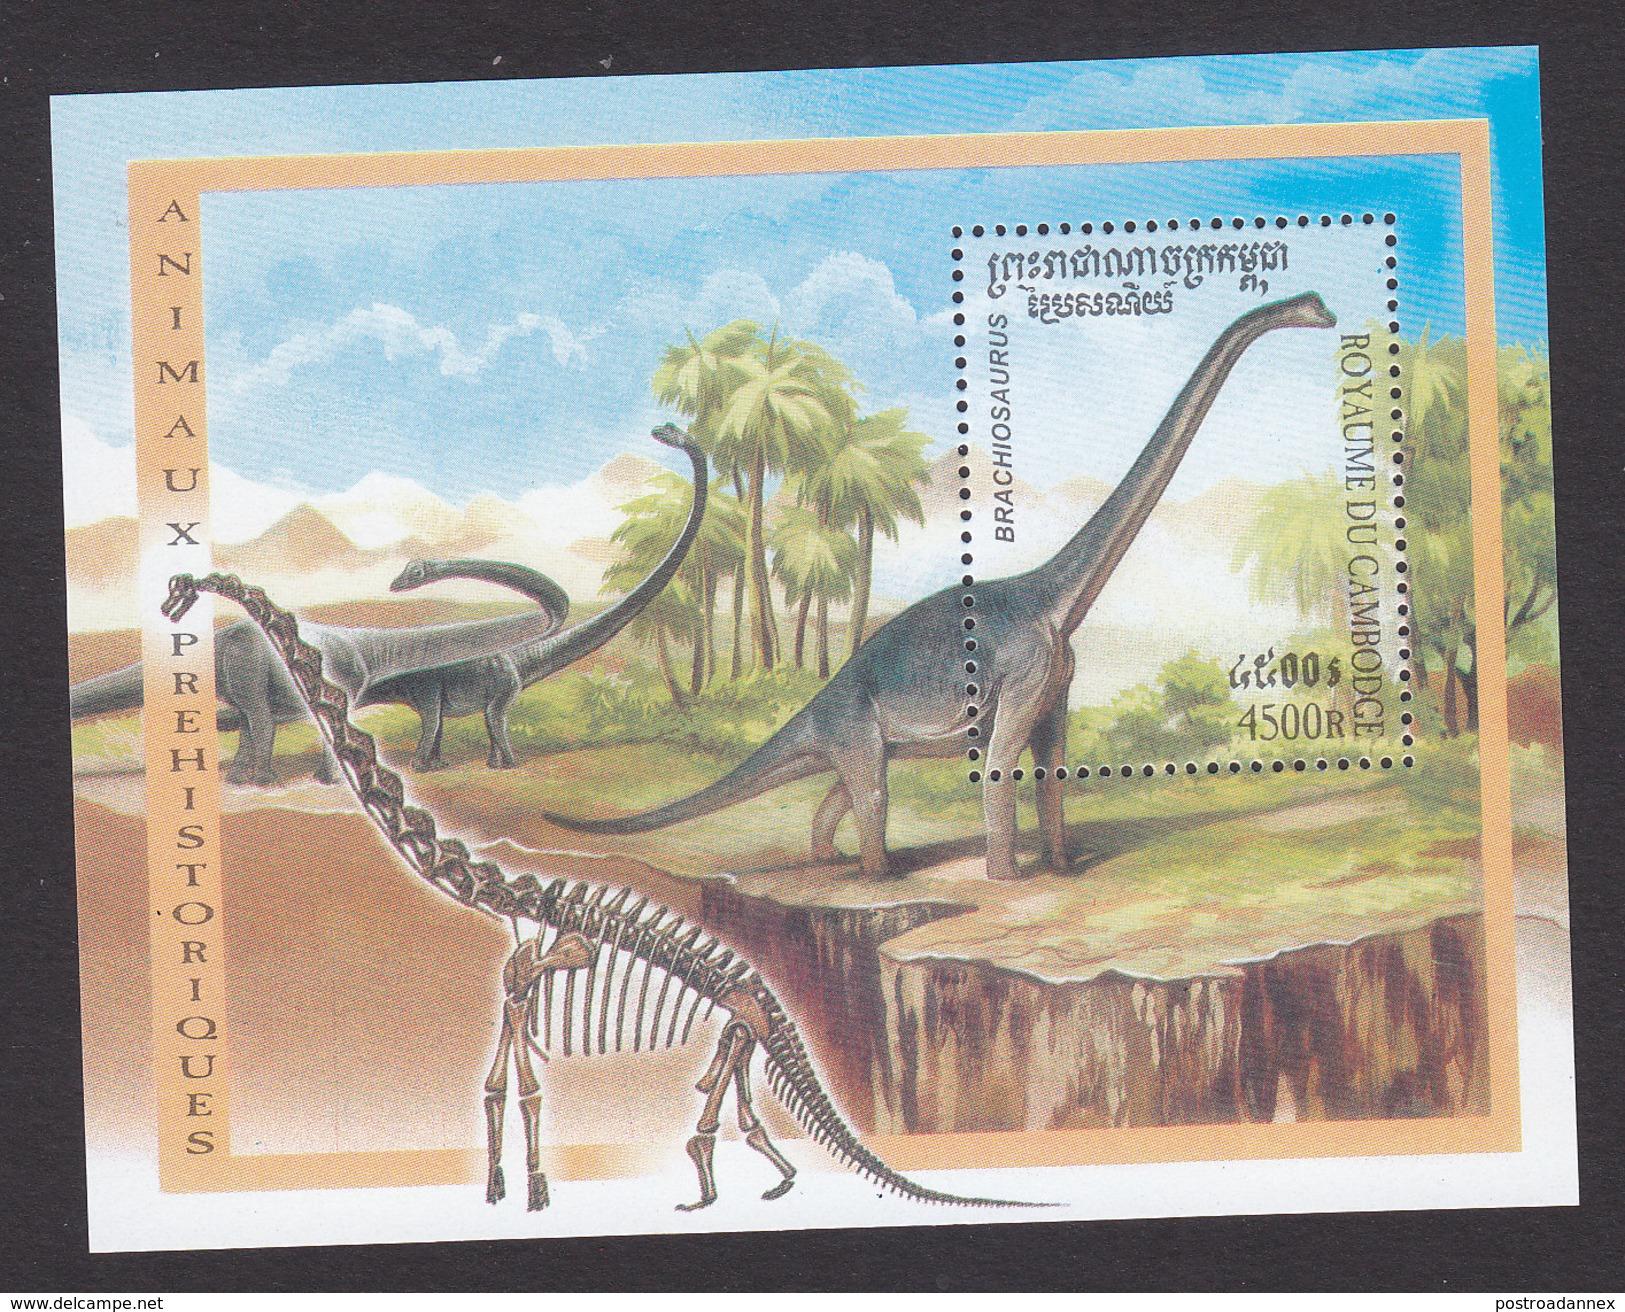 Cambodia, Scott #1930, Mint Hinged, Dinosaurs, Issued 2000 - Cambodia